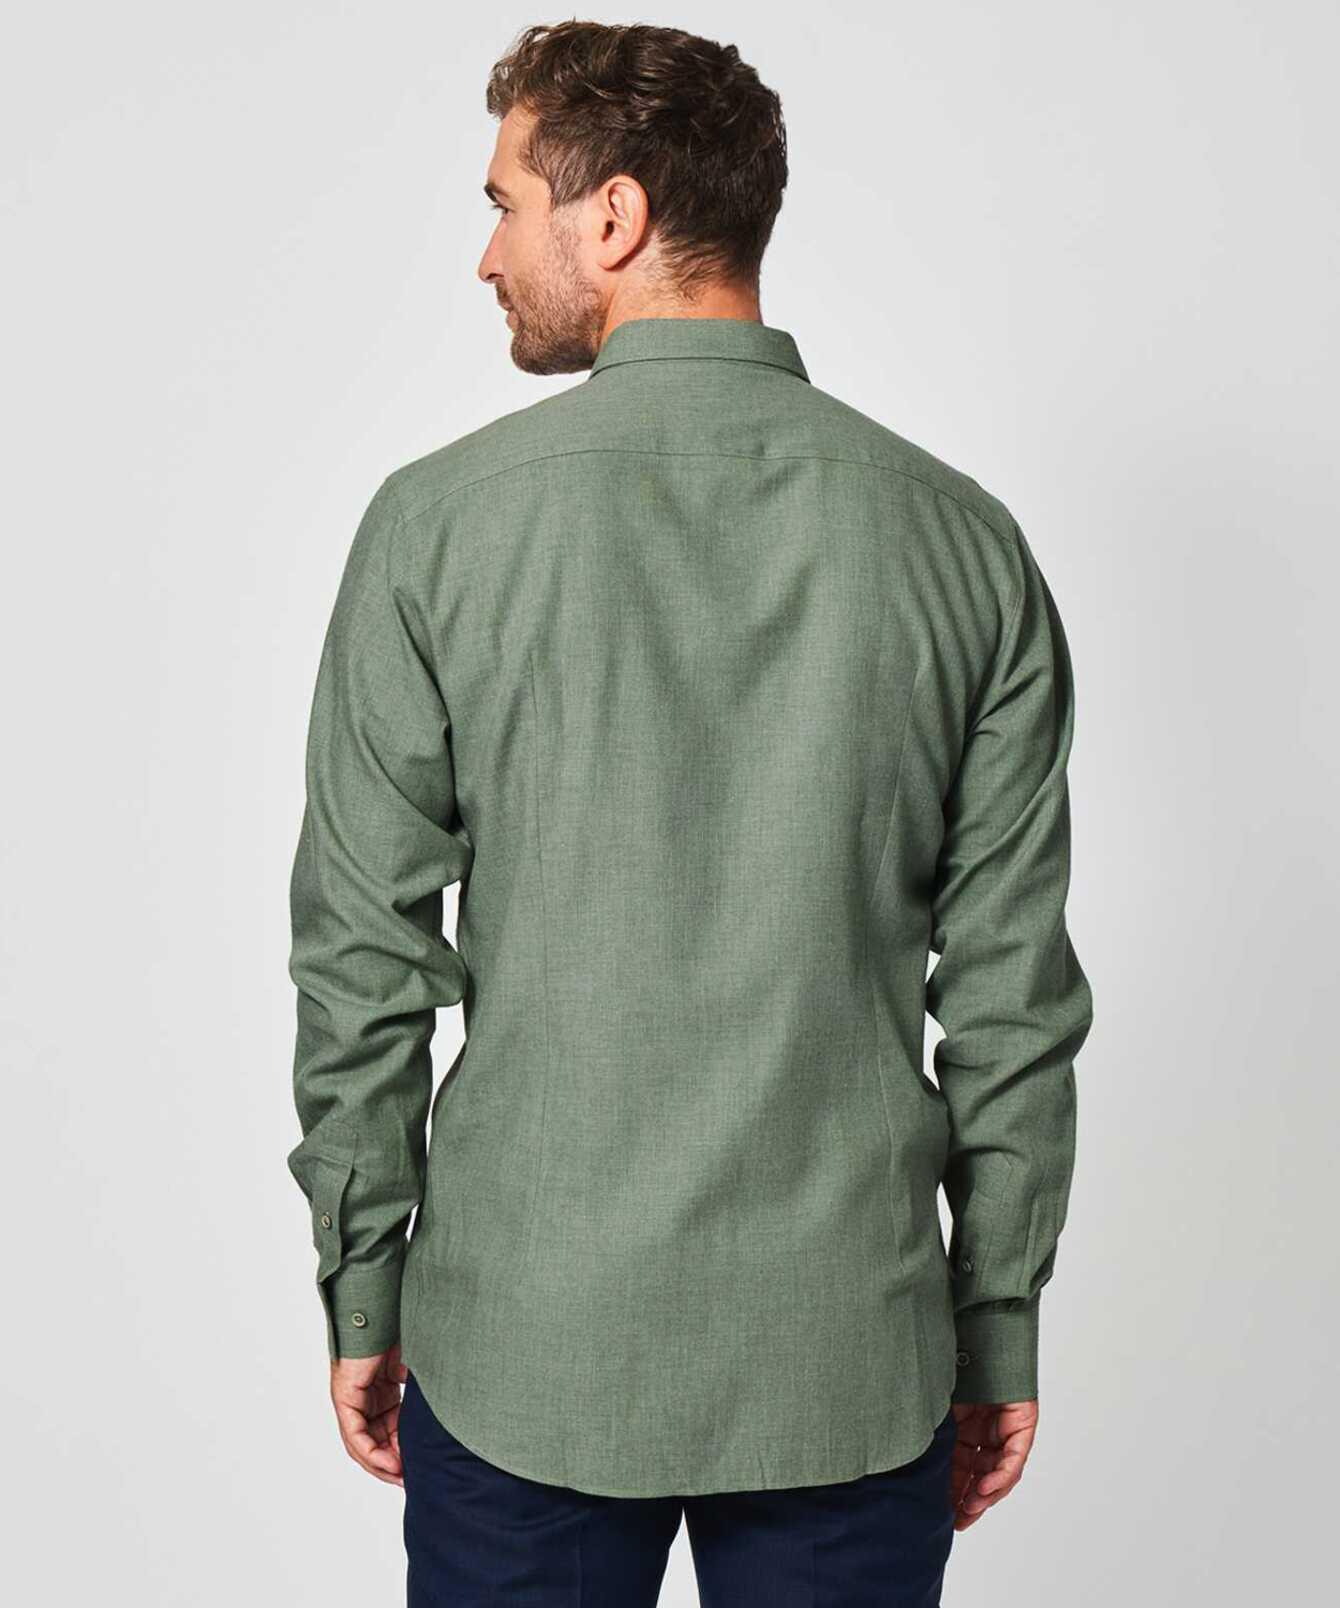 Skjorta Costello Grön  The Shirt Factory